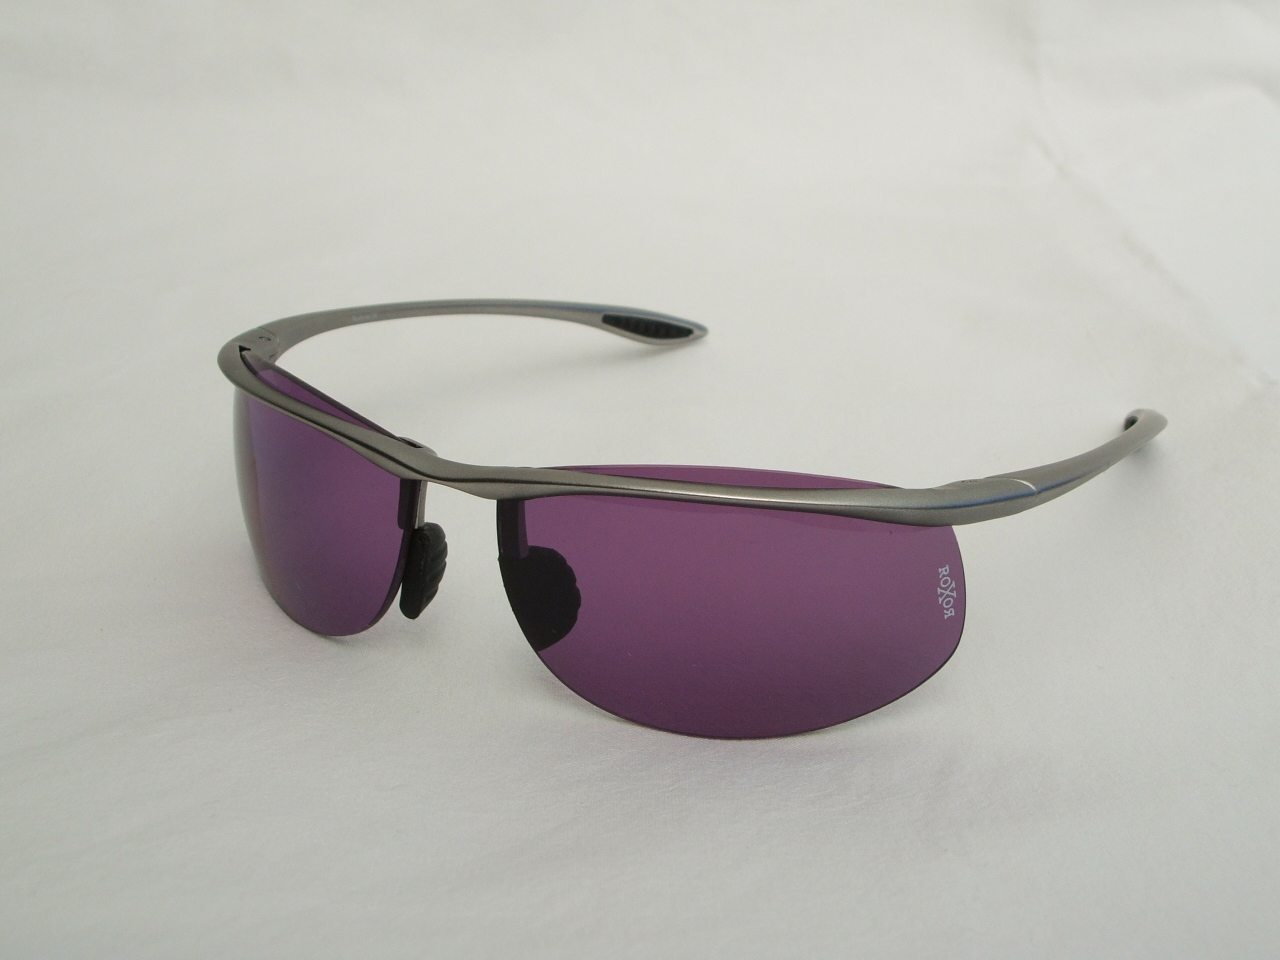 RoXoR® Patented Lens Technology for Golf Sunglasses Hits ...